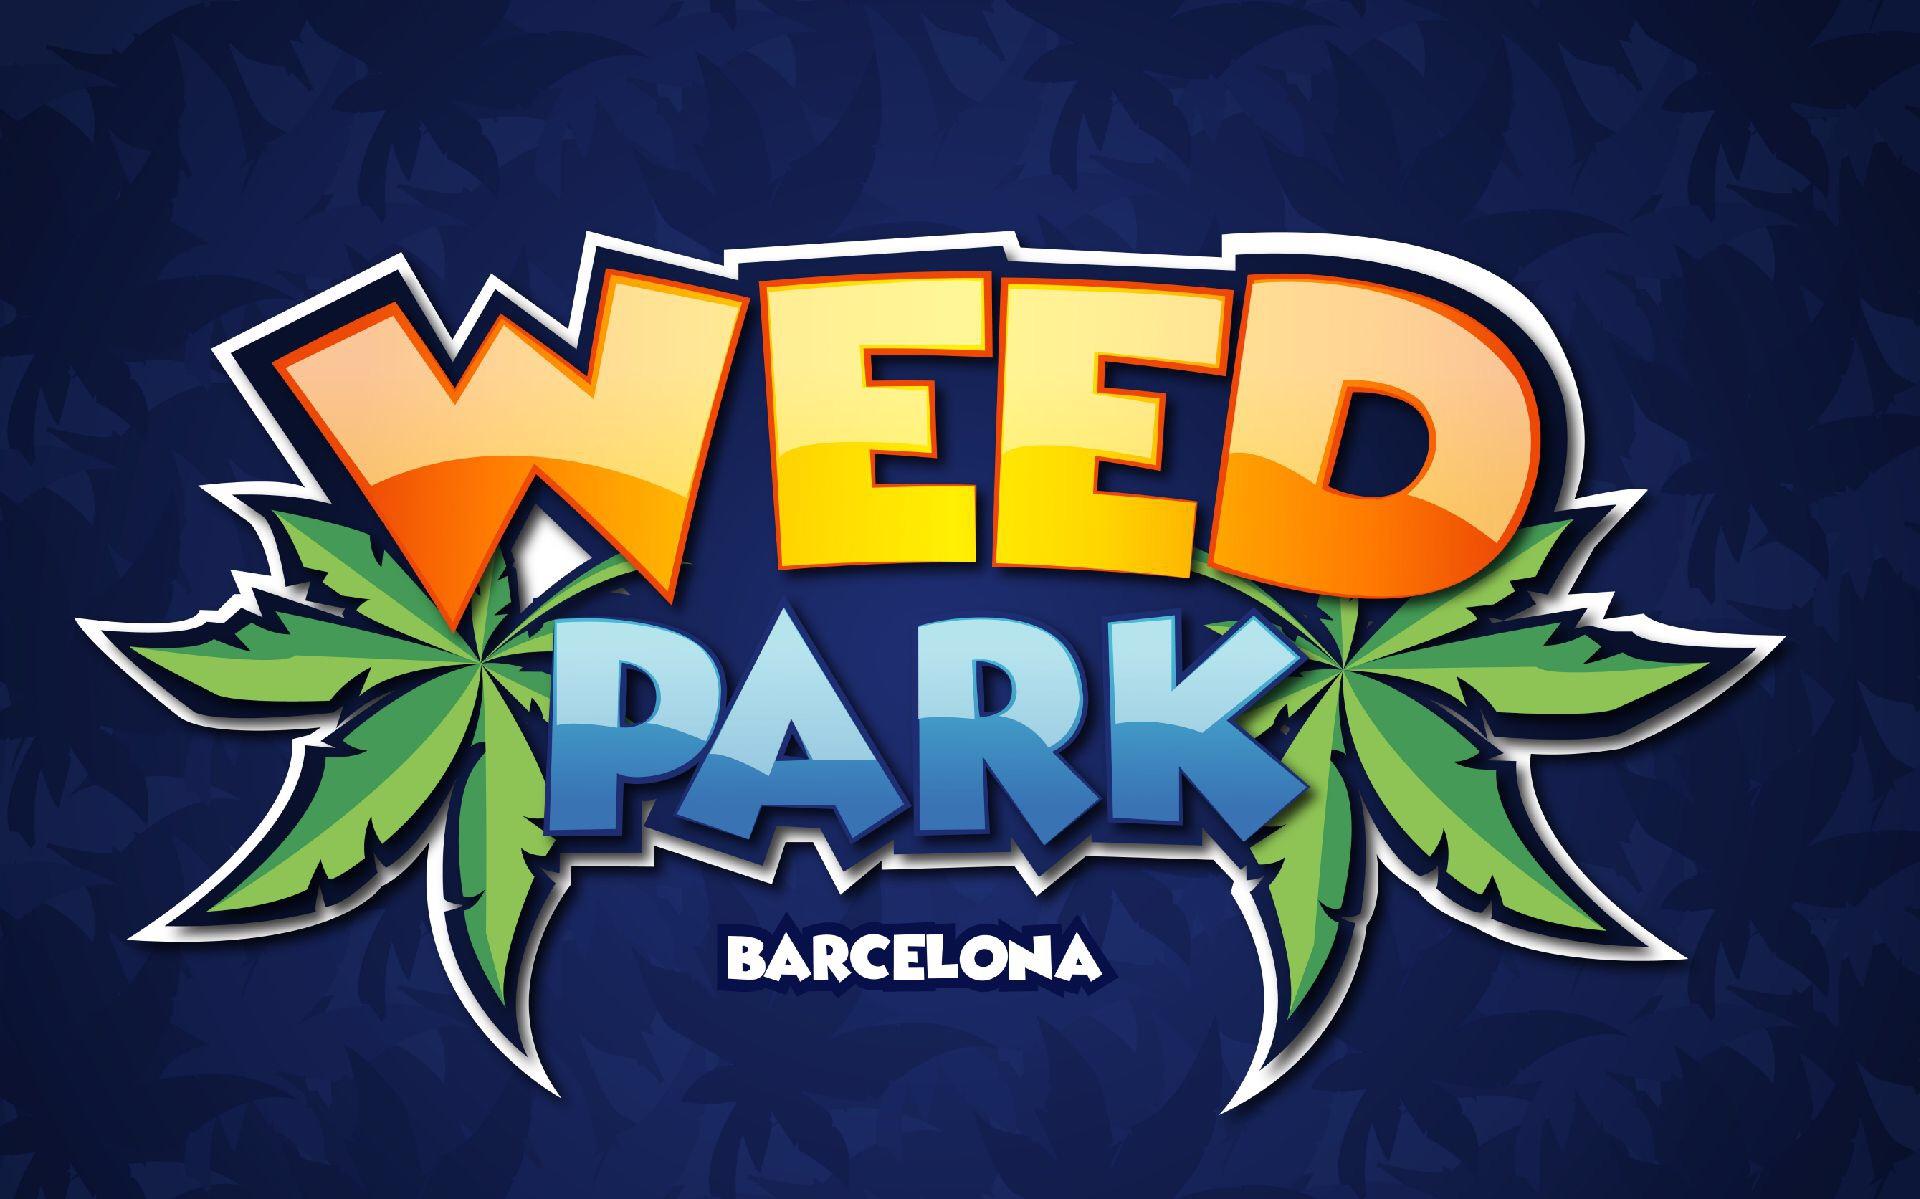 weed club weed park barcelona